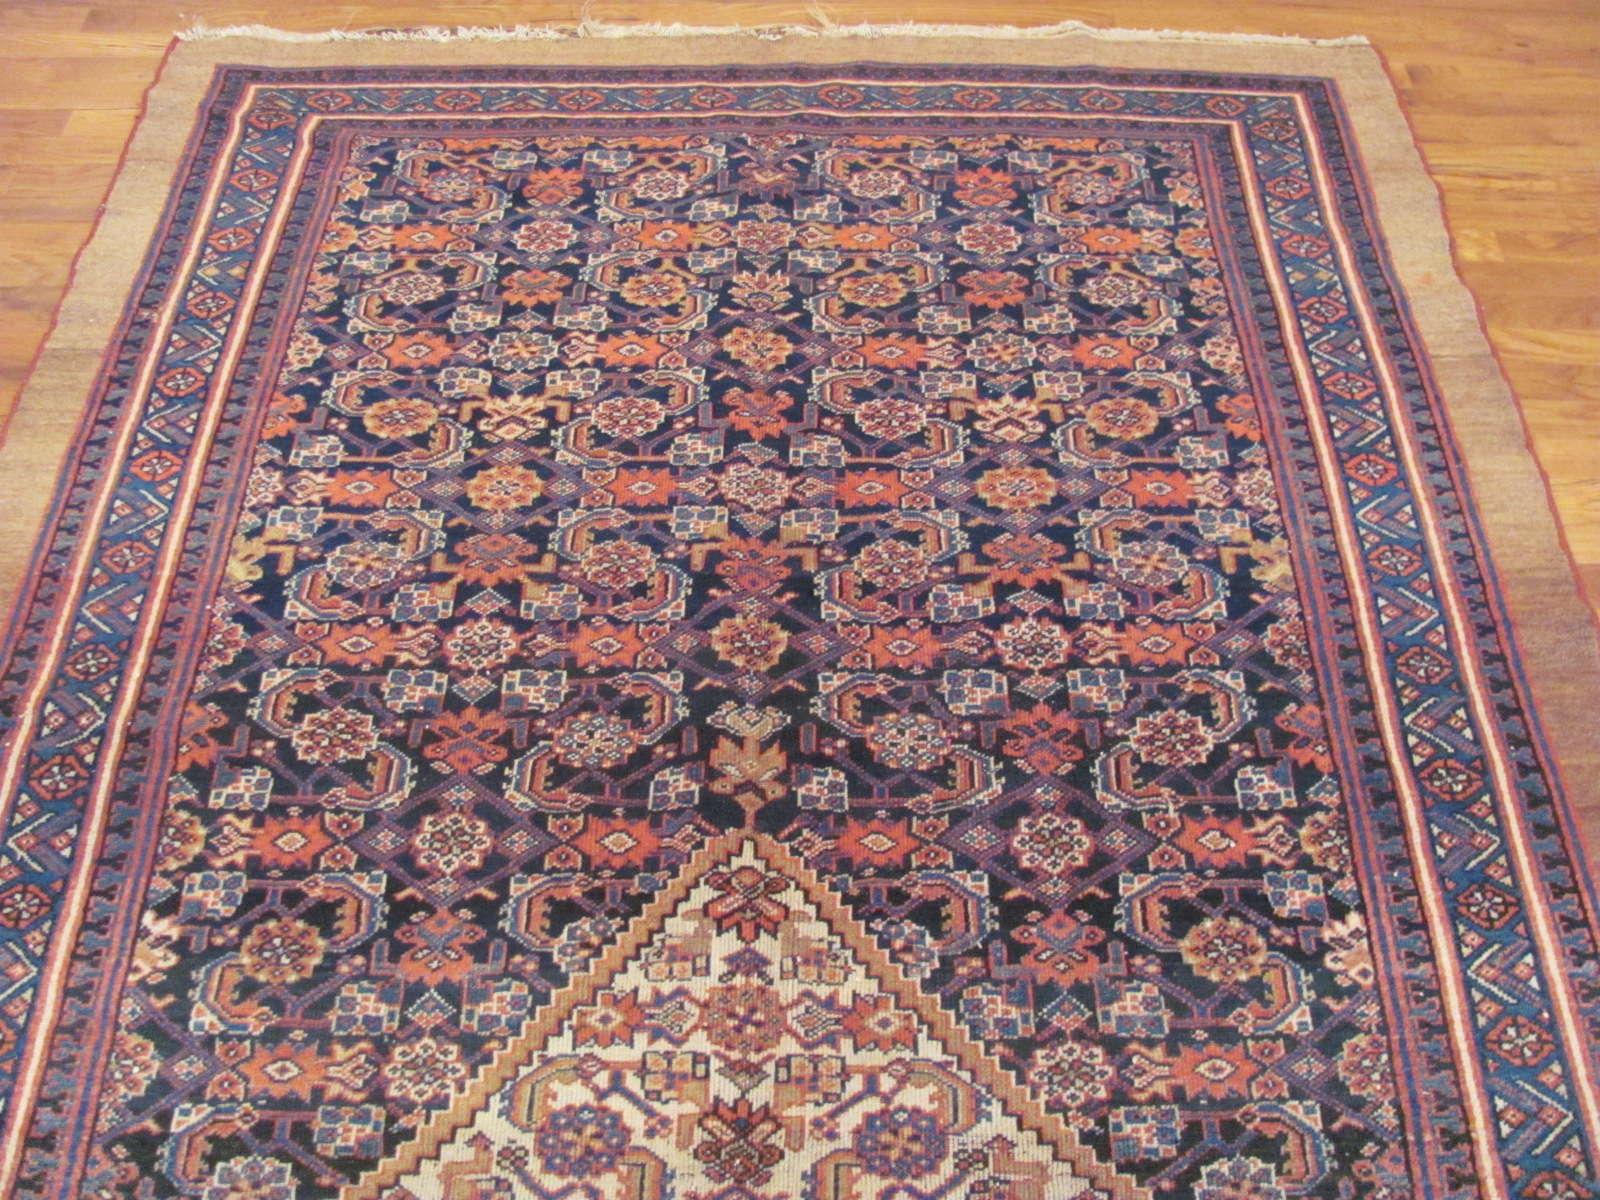 24437 antique Persian Hamadan rug 5,4x10,4 -1